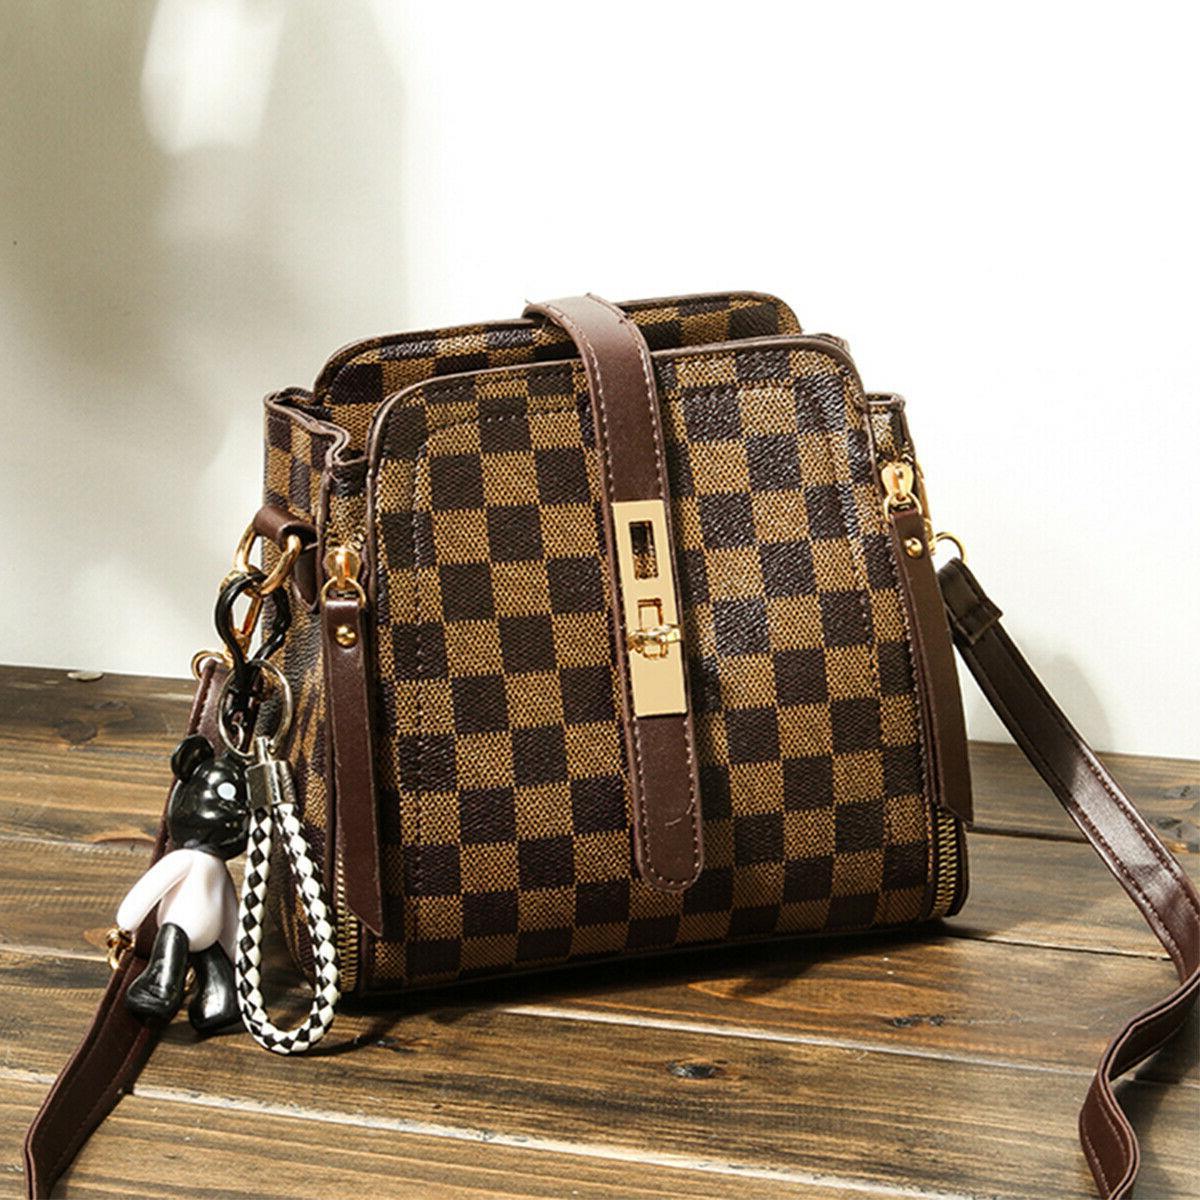 Small Bags for Women Leather Handbag